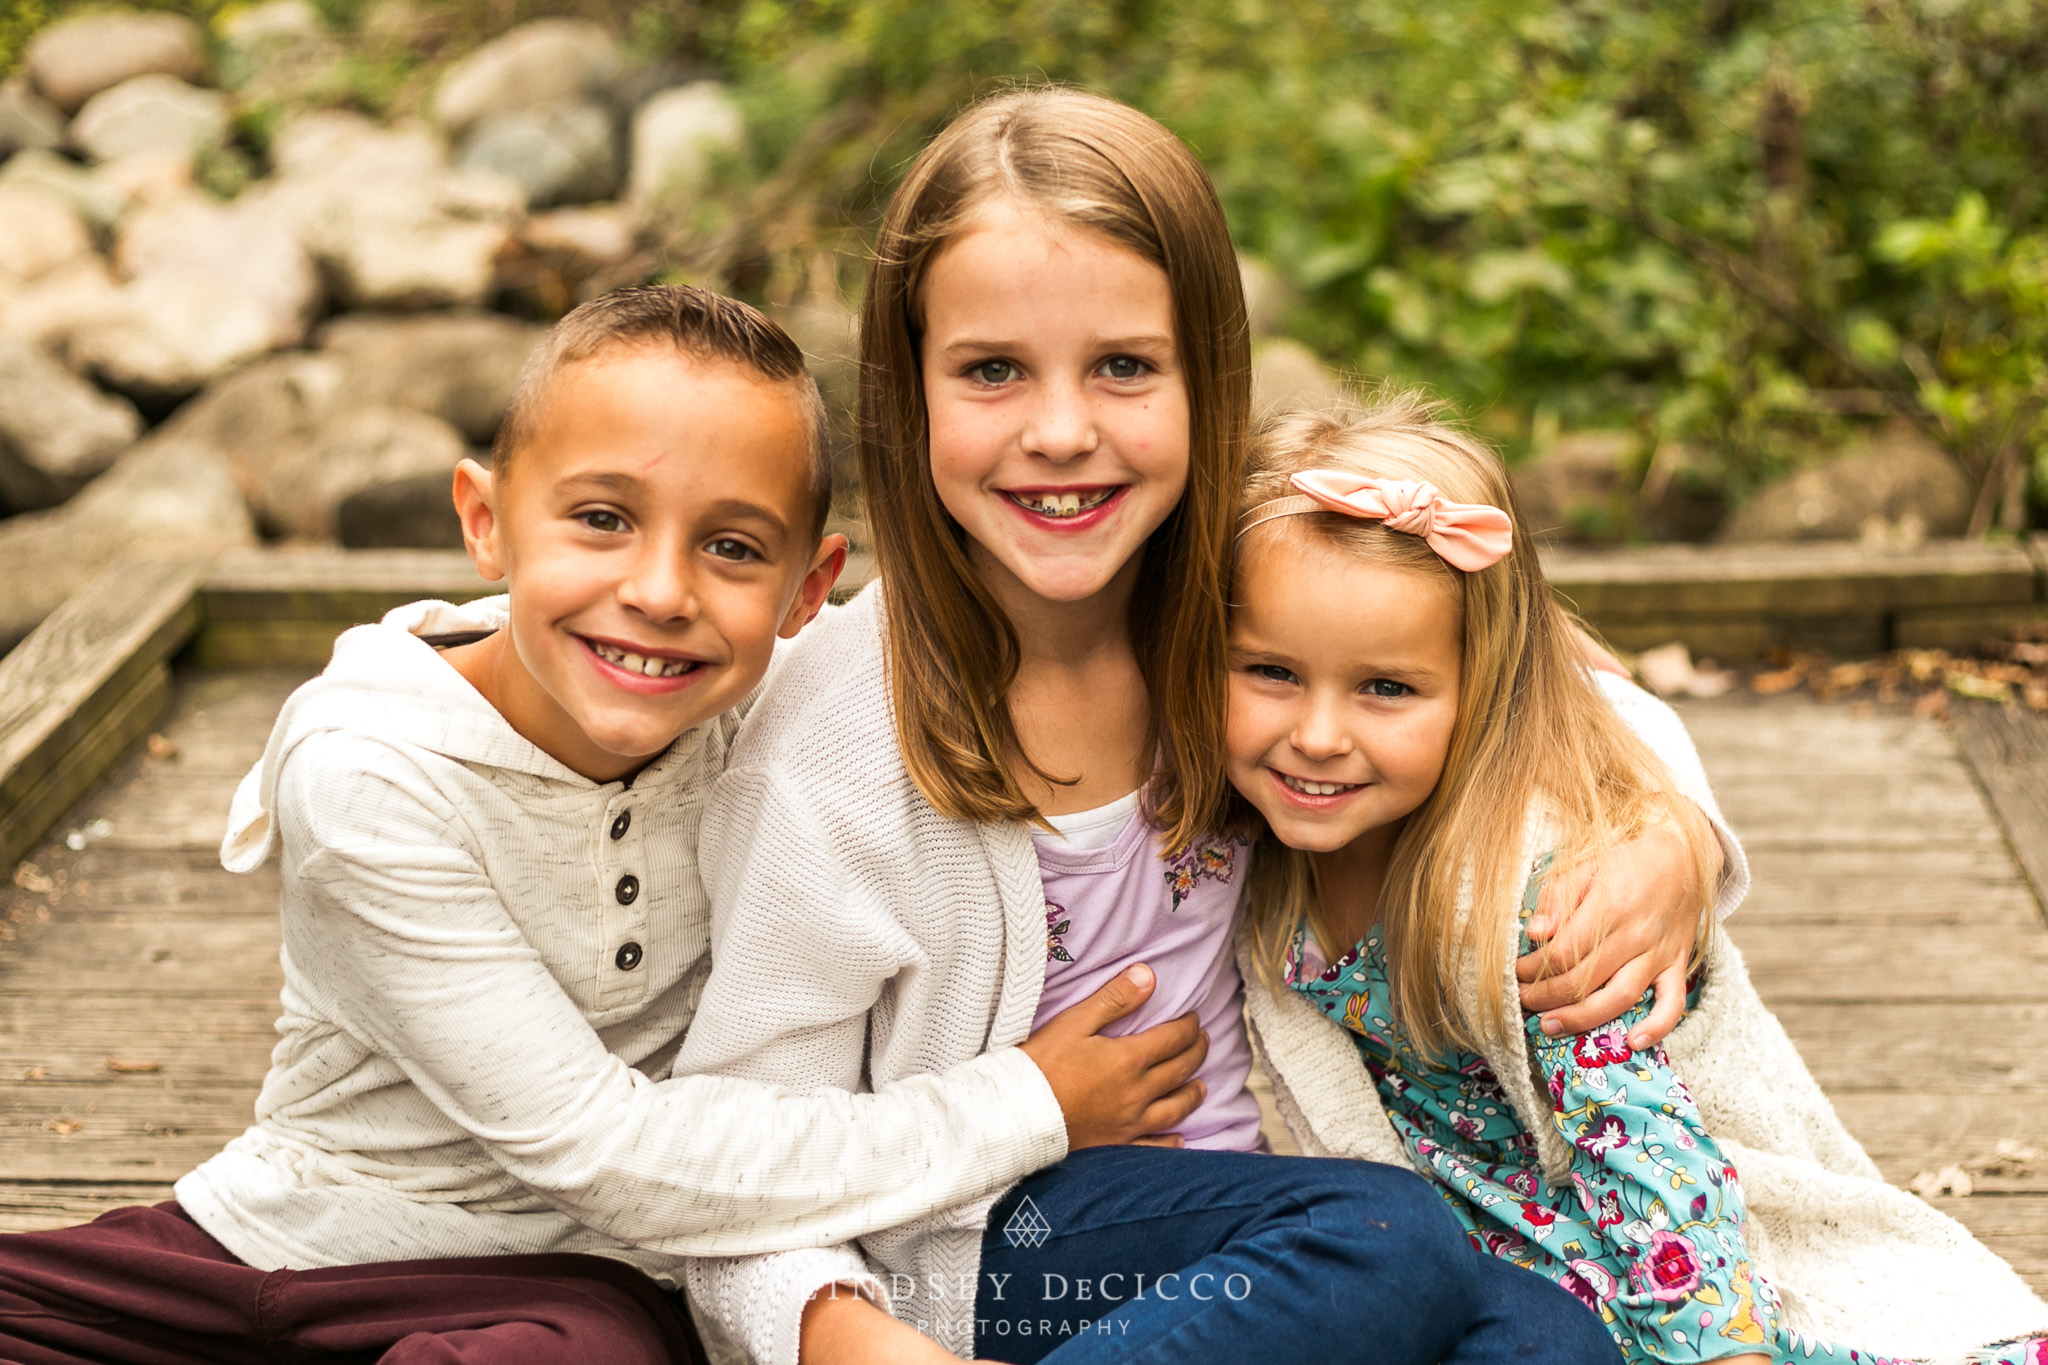 Siblings pose for 3 children